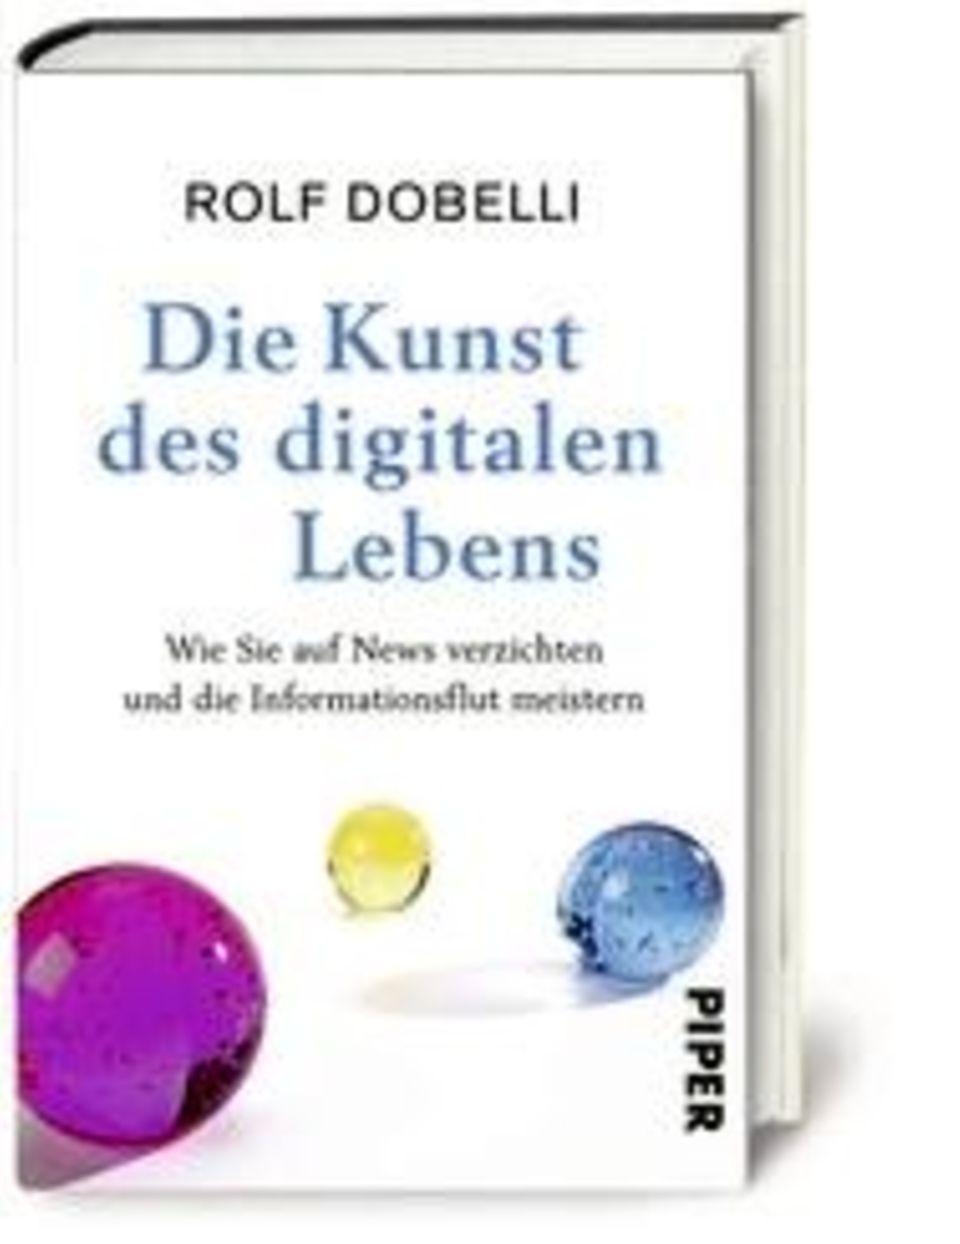 Rolf Dobelli, Die Kunst des digitalen Lebens